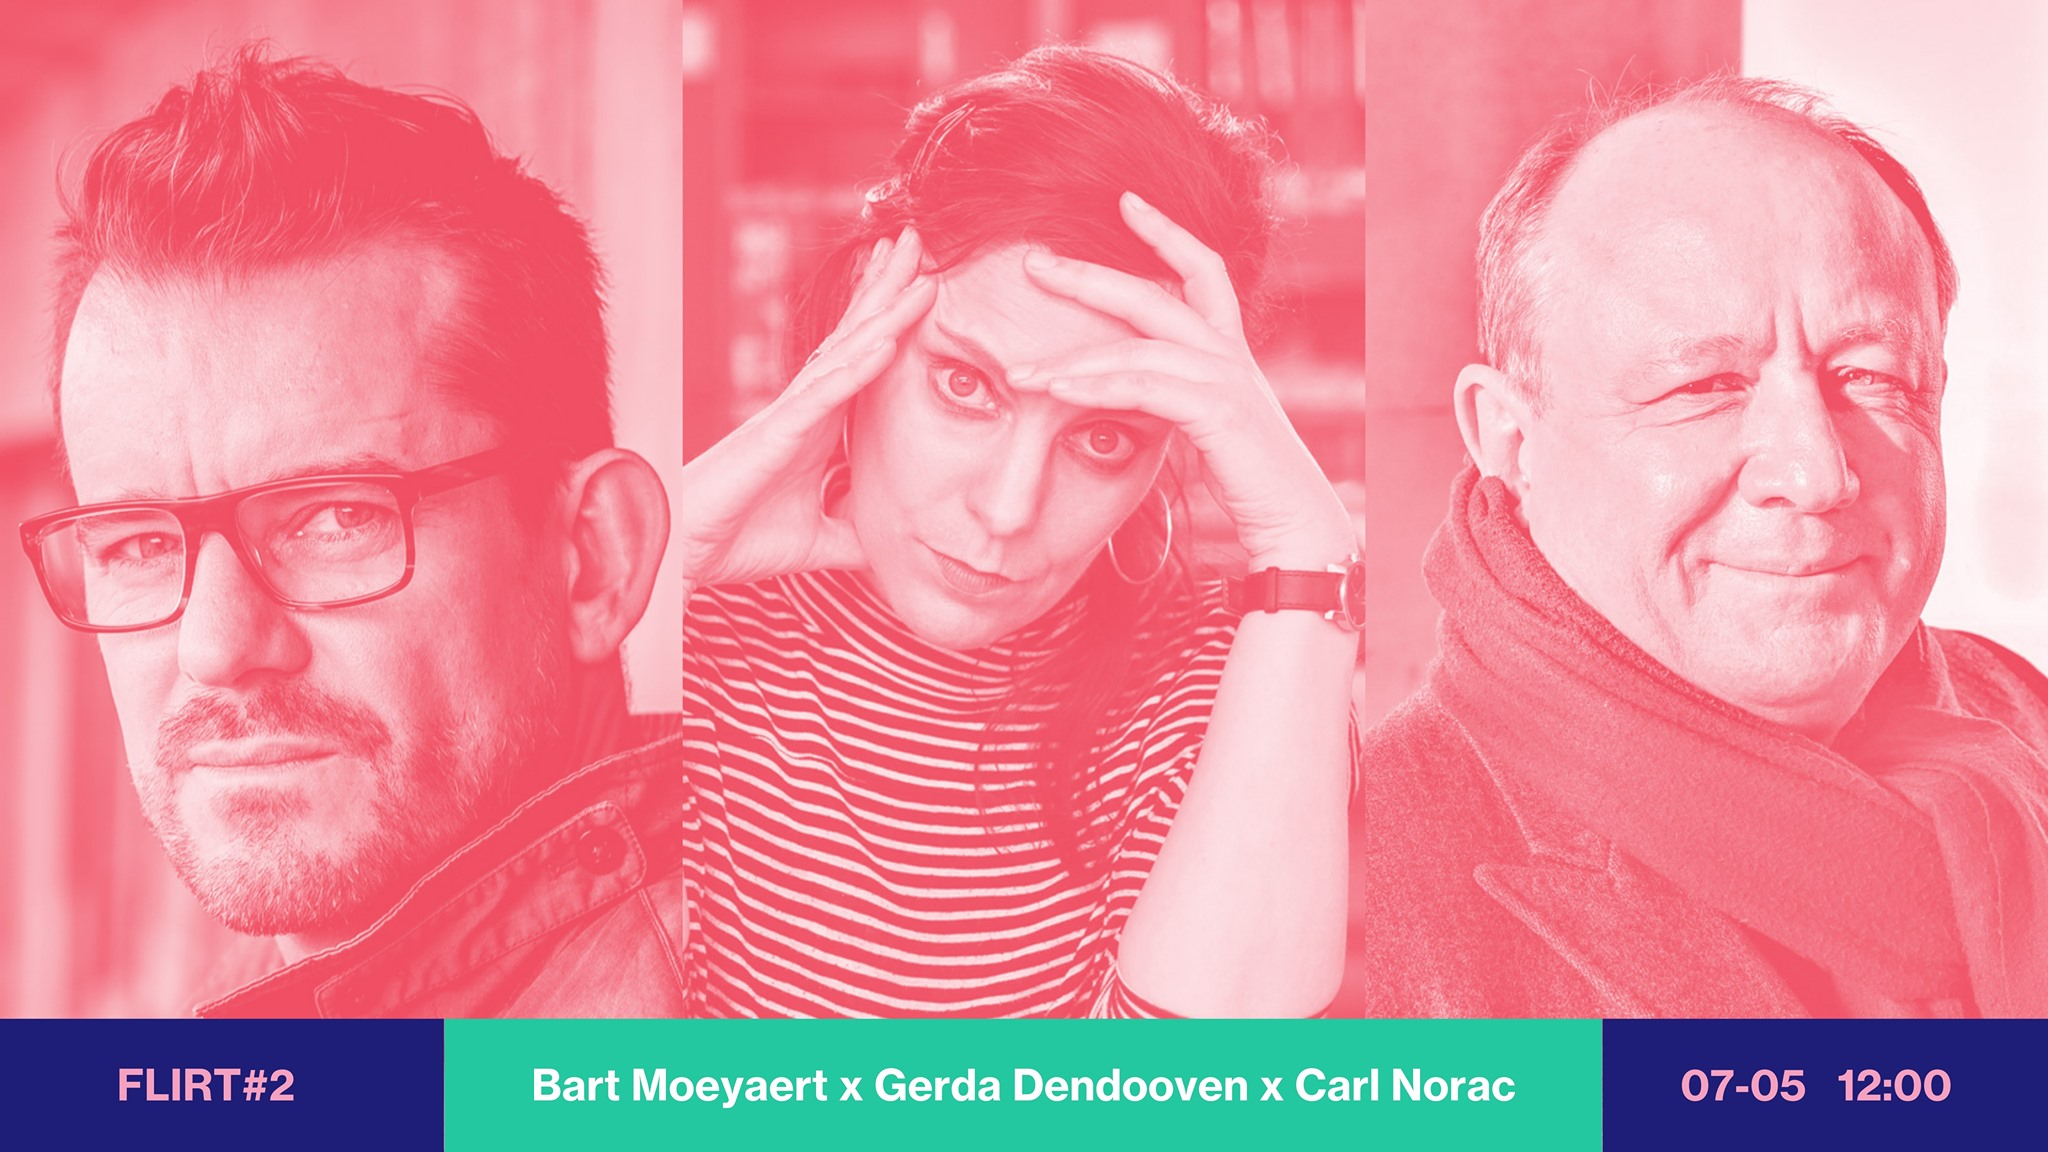 FLIRT #2 Bart Moeyaert, Gerda Dendooven & Carl Norac